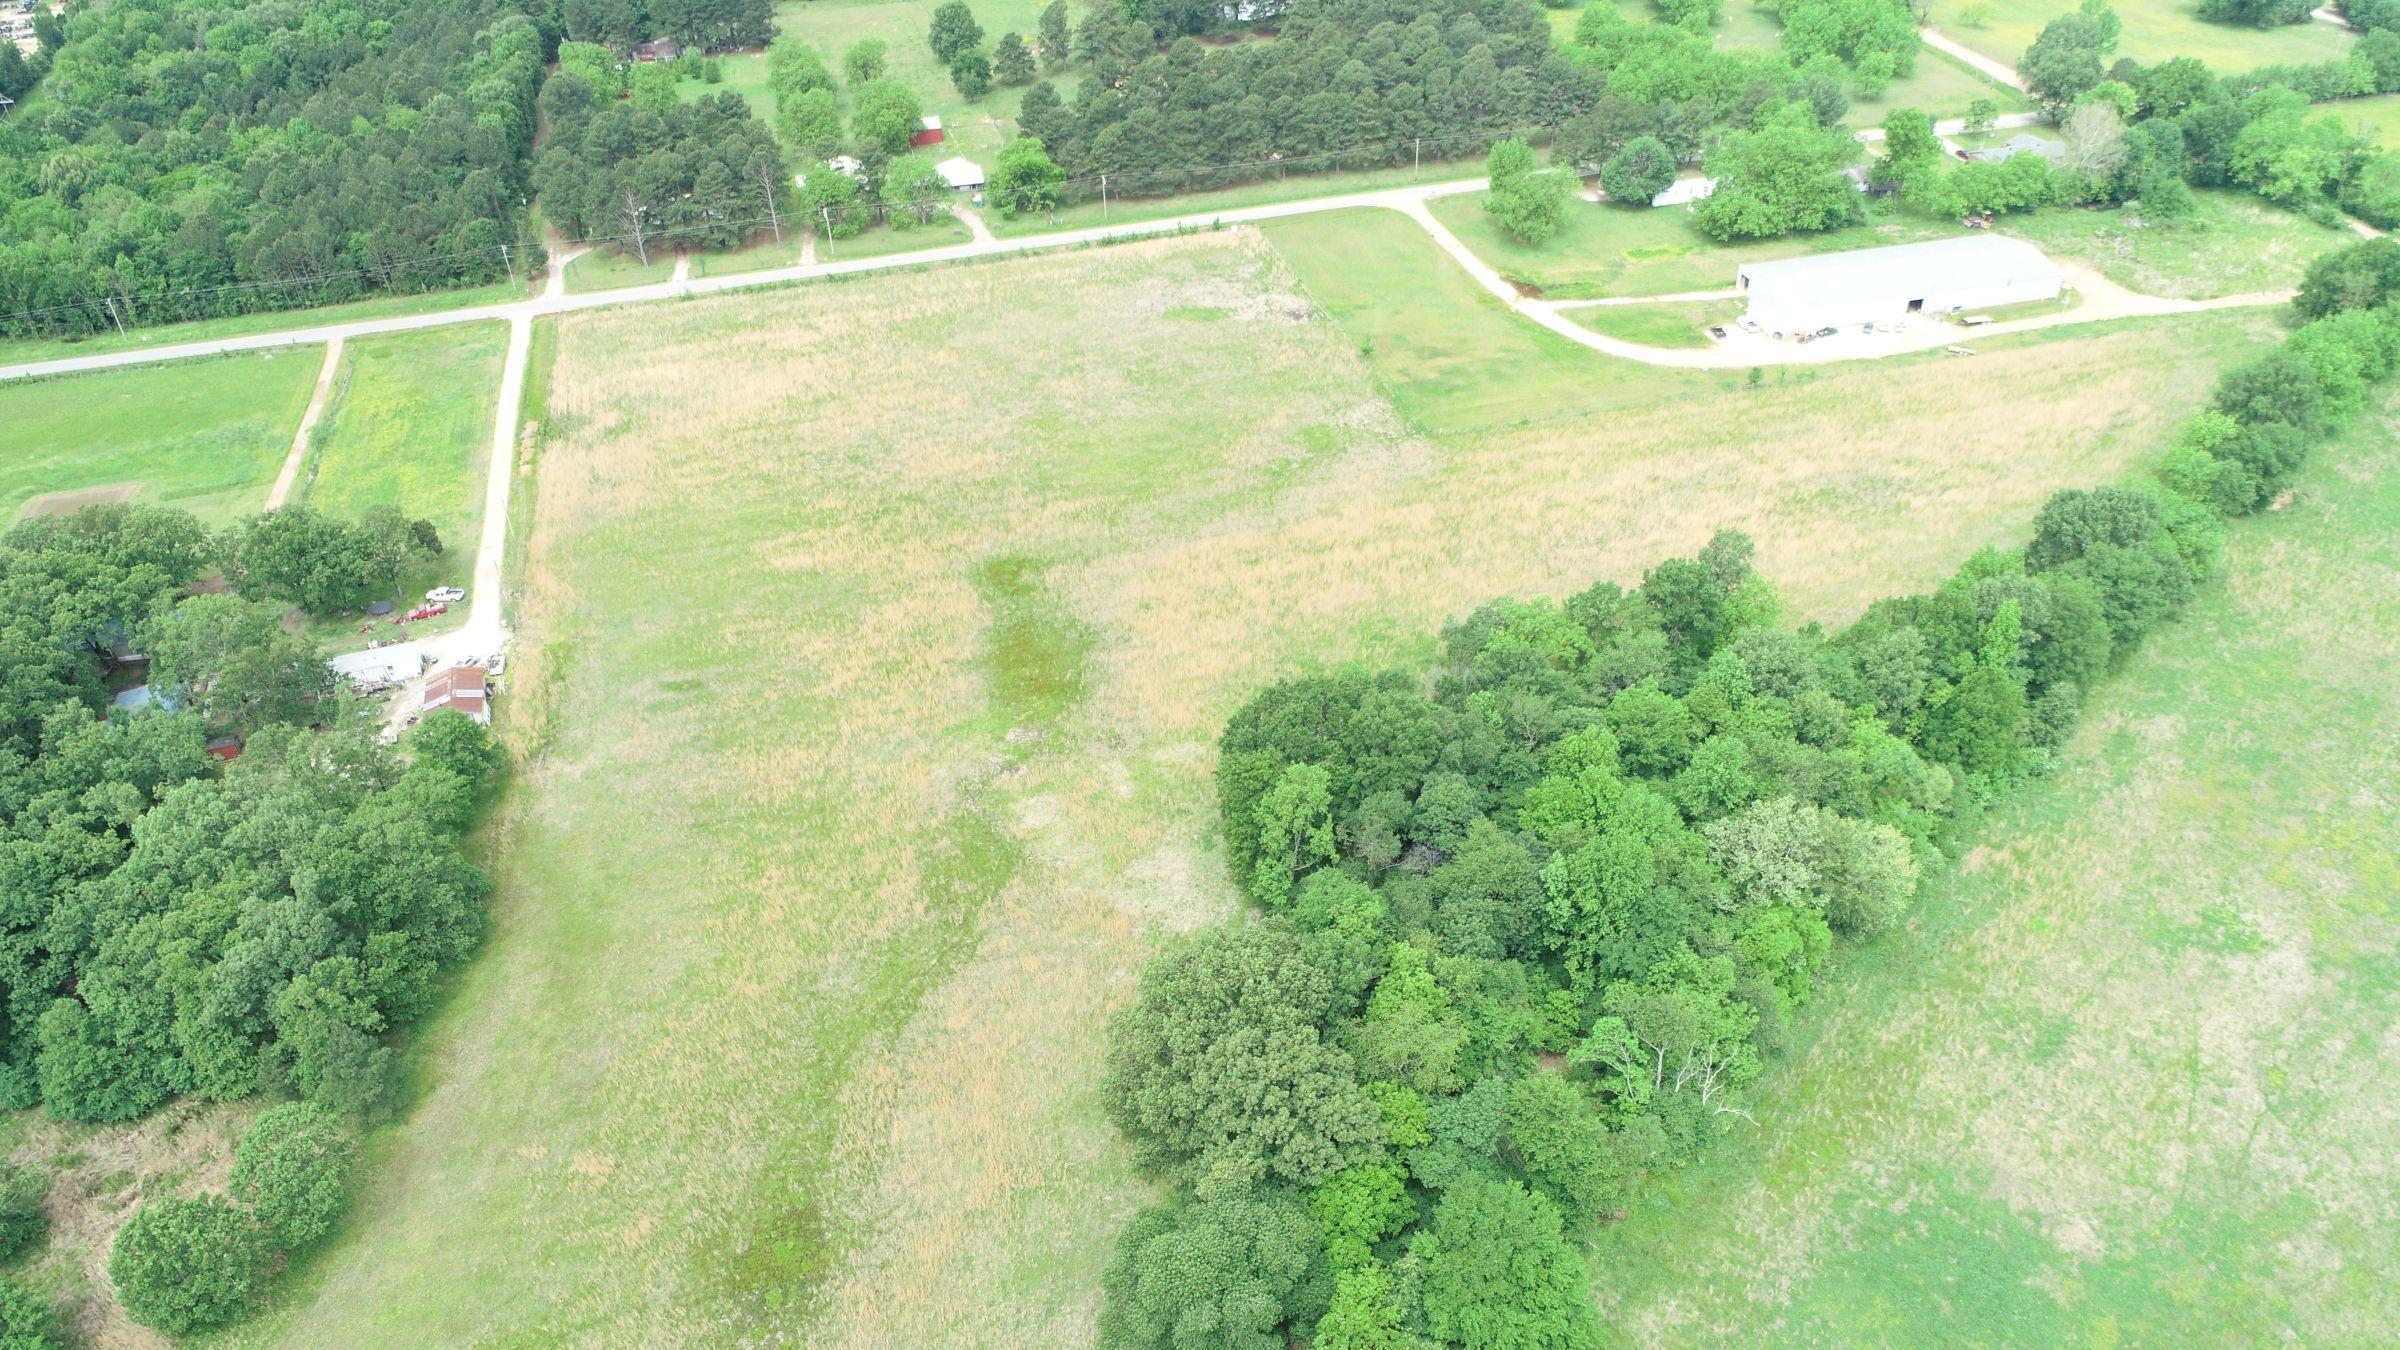 land-craighead-county-arkansas-52-acres-listing-number-15002-2-2020-06-01-215648.JPG